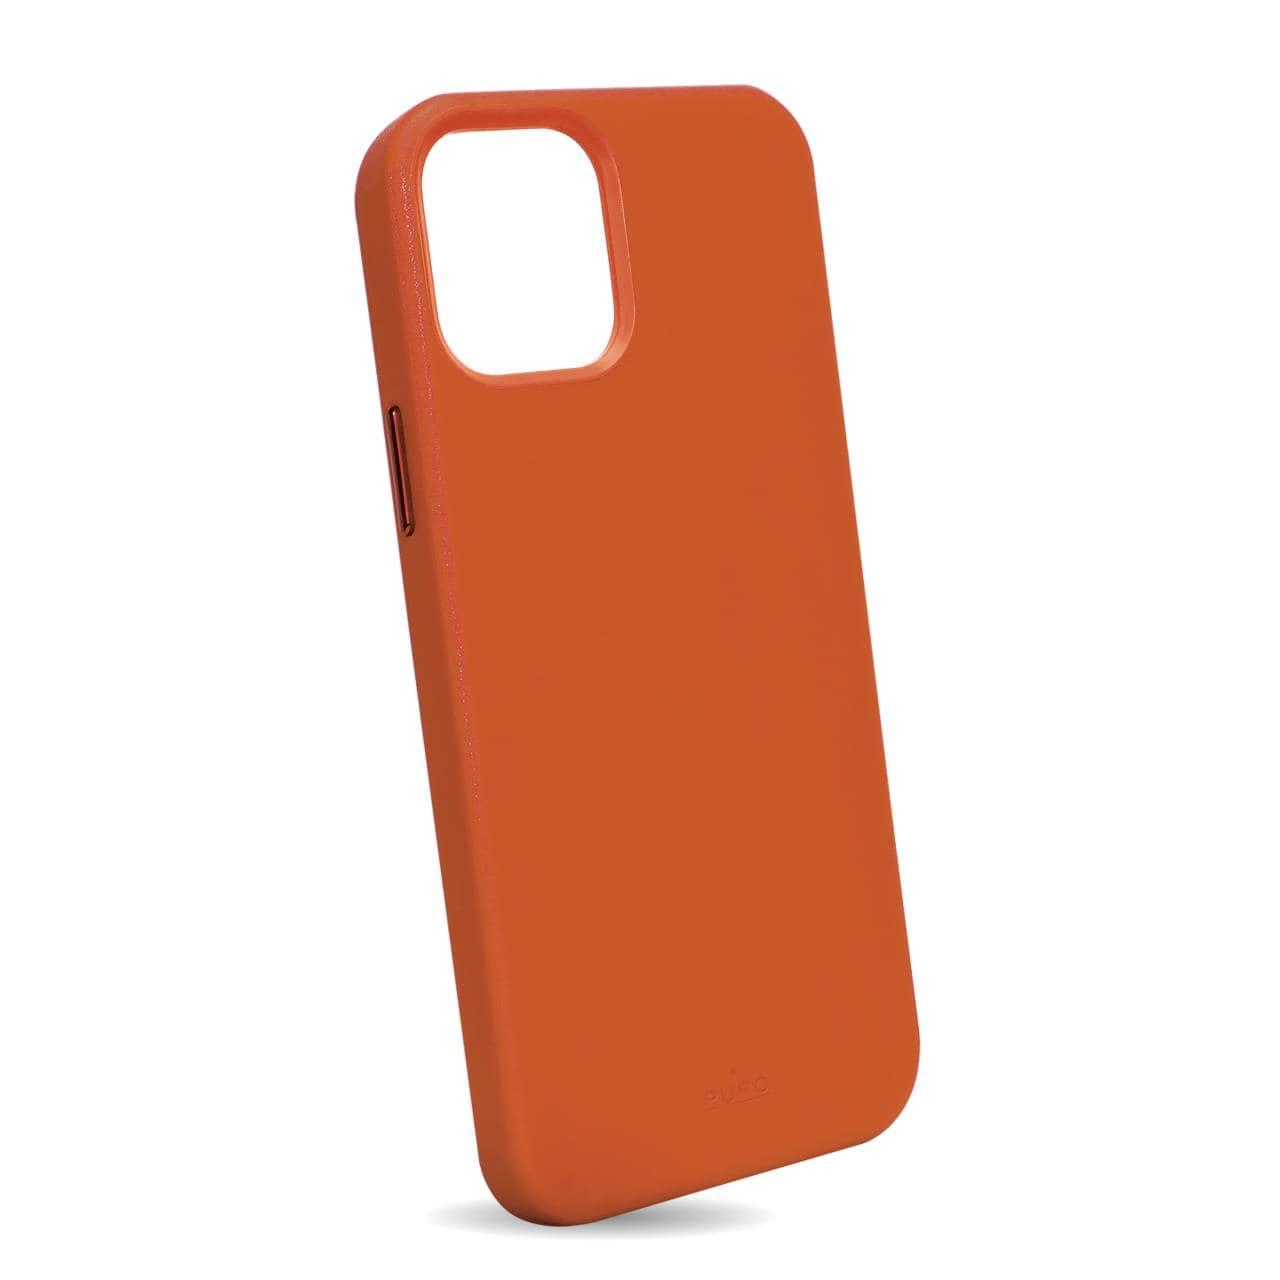 puro-cover-similpelle-sky-iphone-13-arancione_01-min